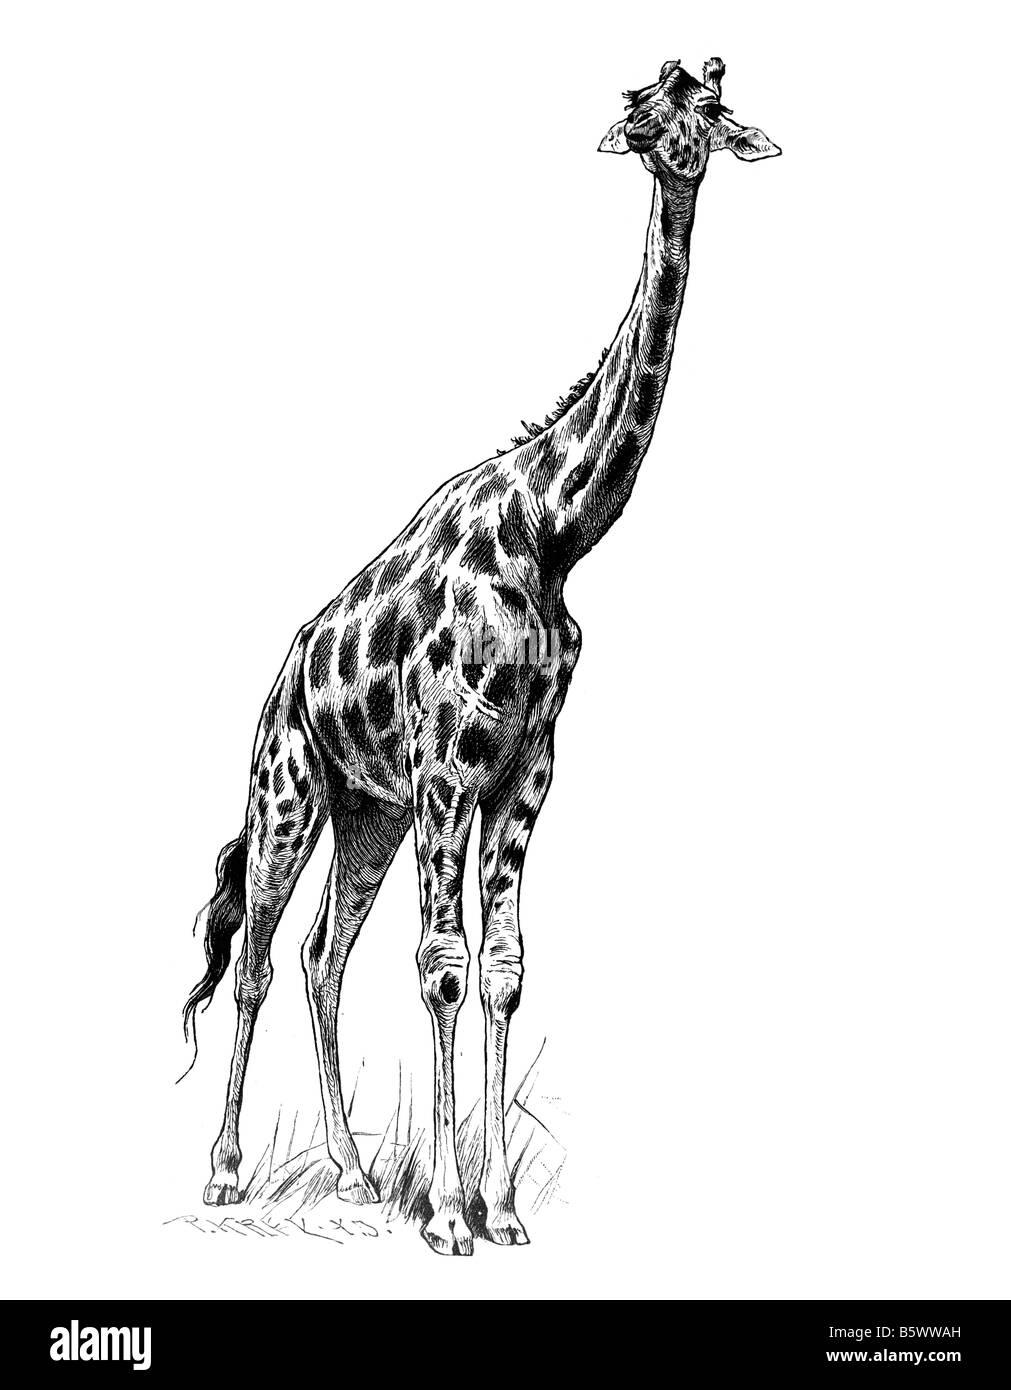 Giraffe (Giraffa Plancius), Familie Giraffidae Gattung Giraffa Stockfoto